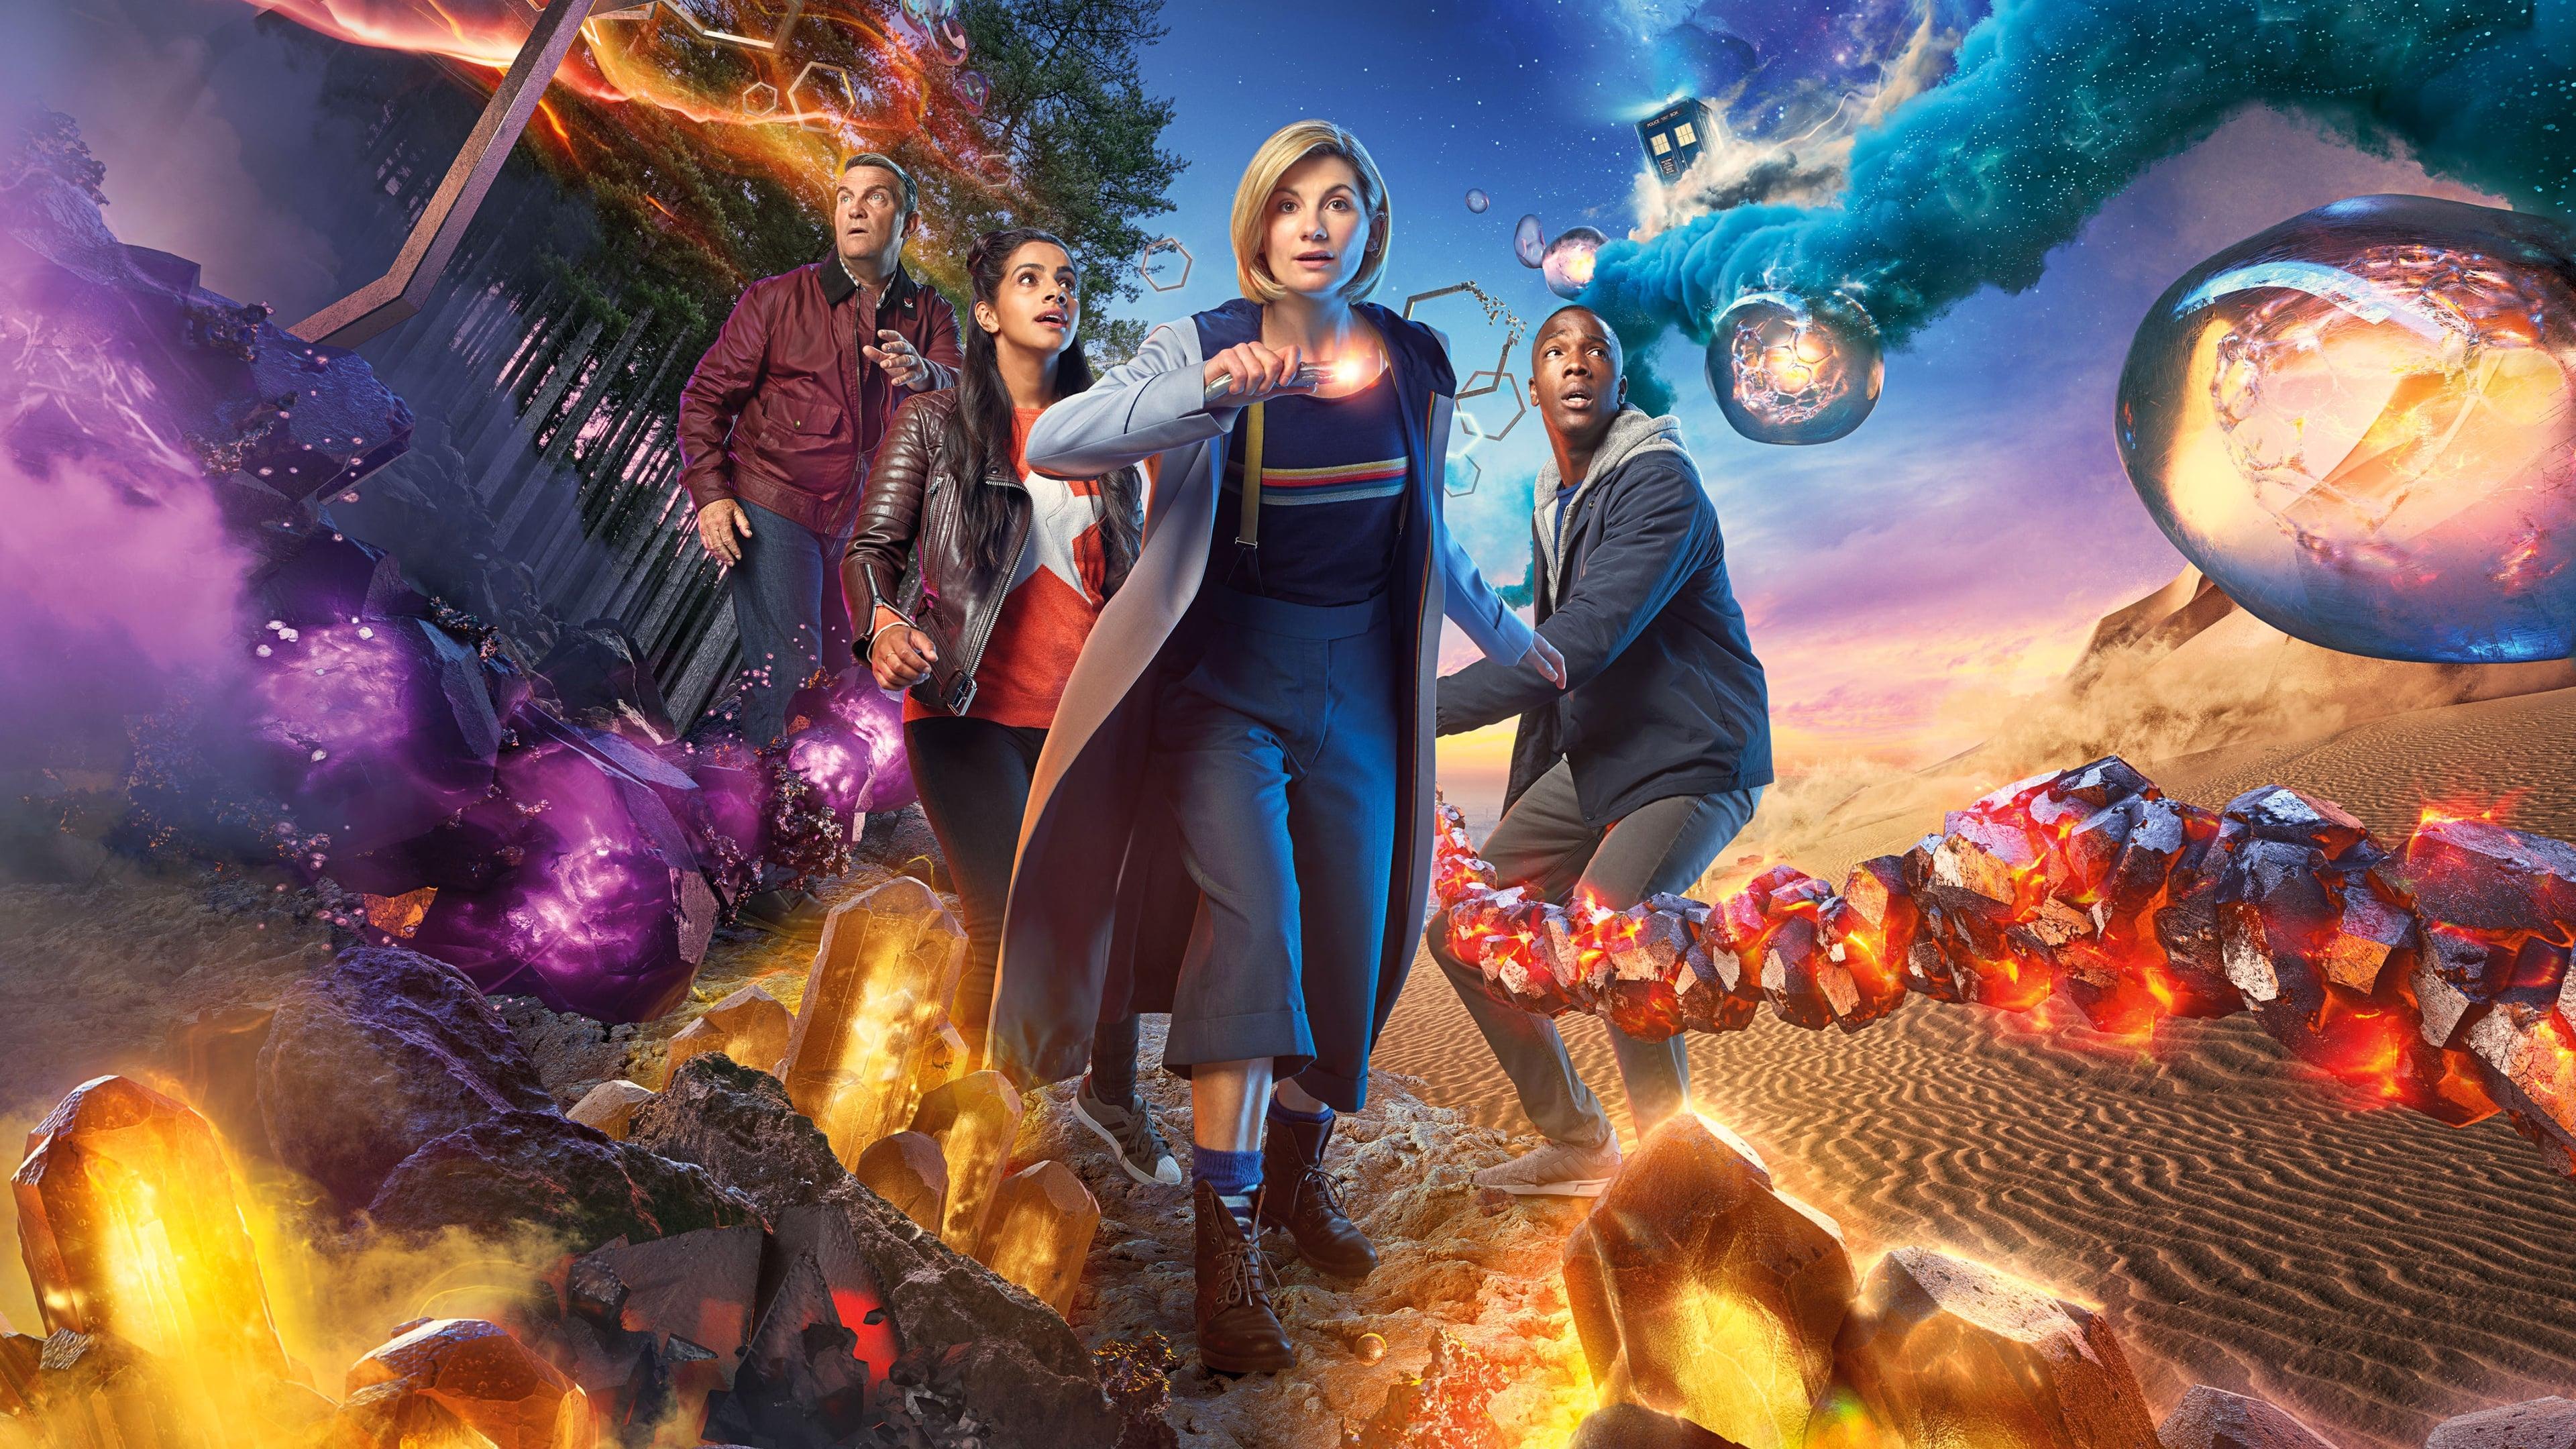 1920x1080 Doctor Who 1080p Laptop Full Hd Wallpaper Hd Tv Series